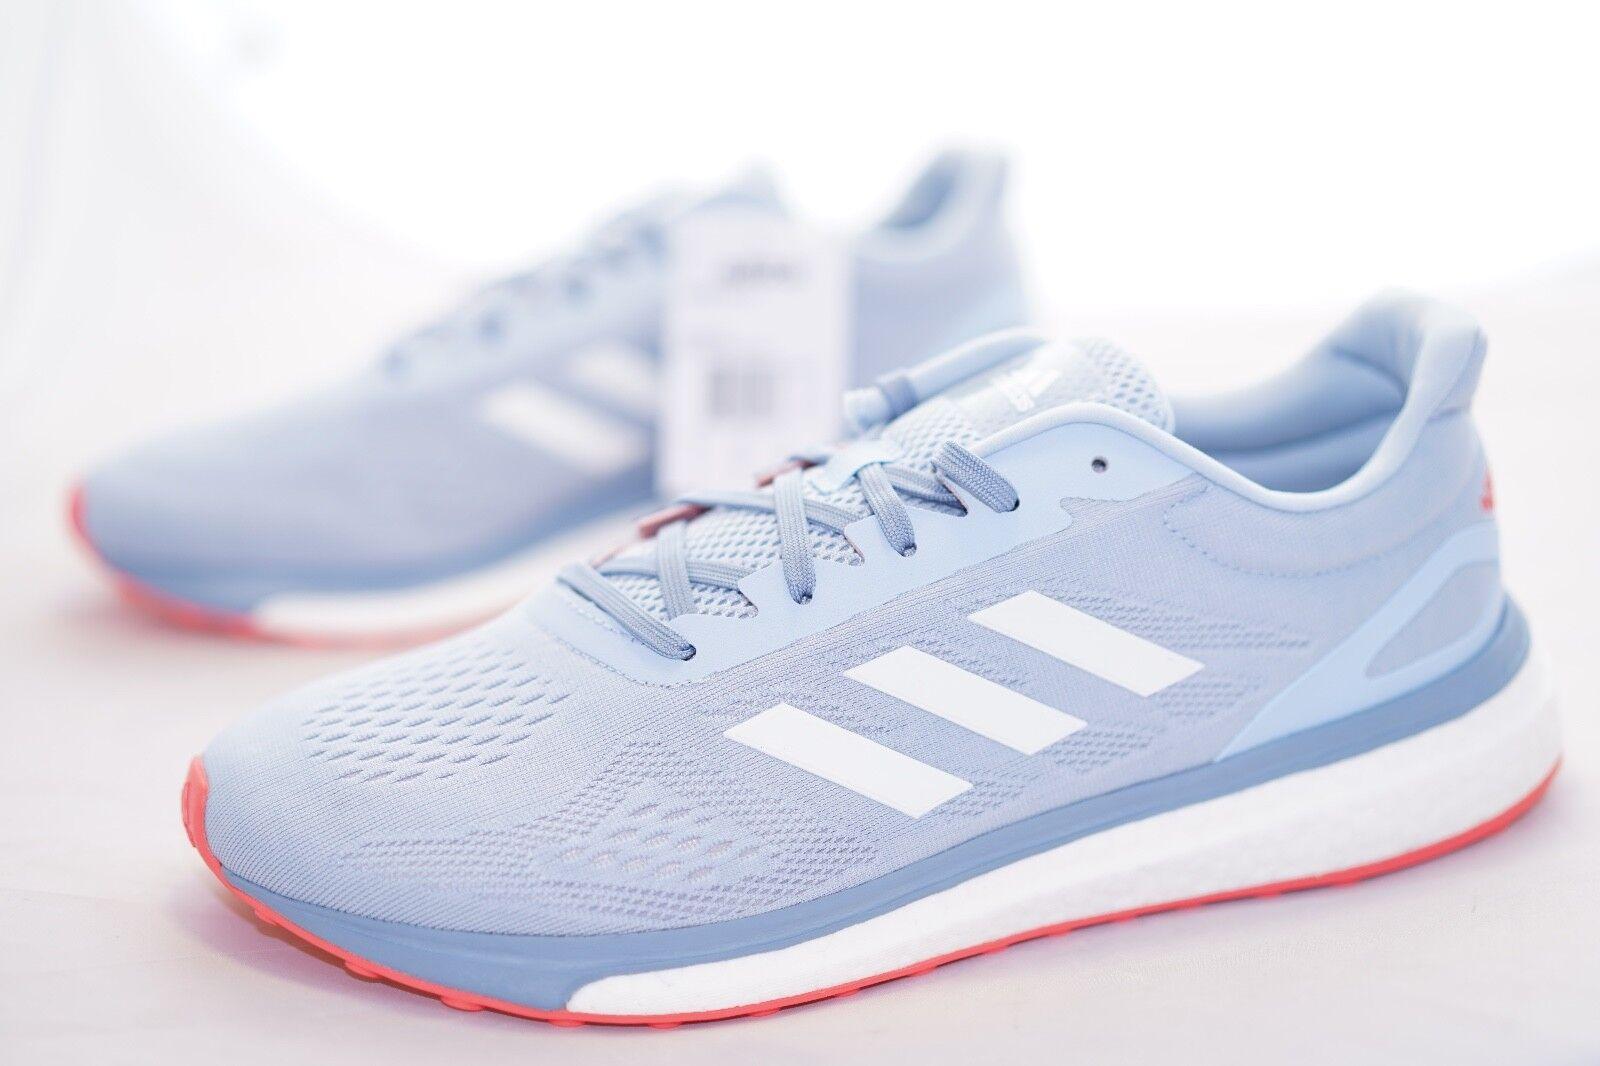 Adidas Response LT Lite Boost Femme Running Baskets Chaussures Taille UK 8 (HO1d)